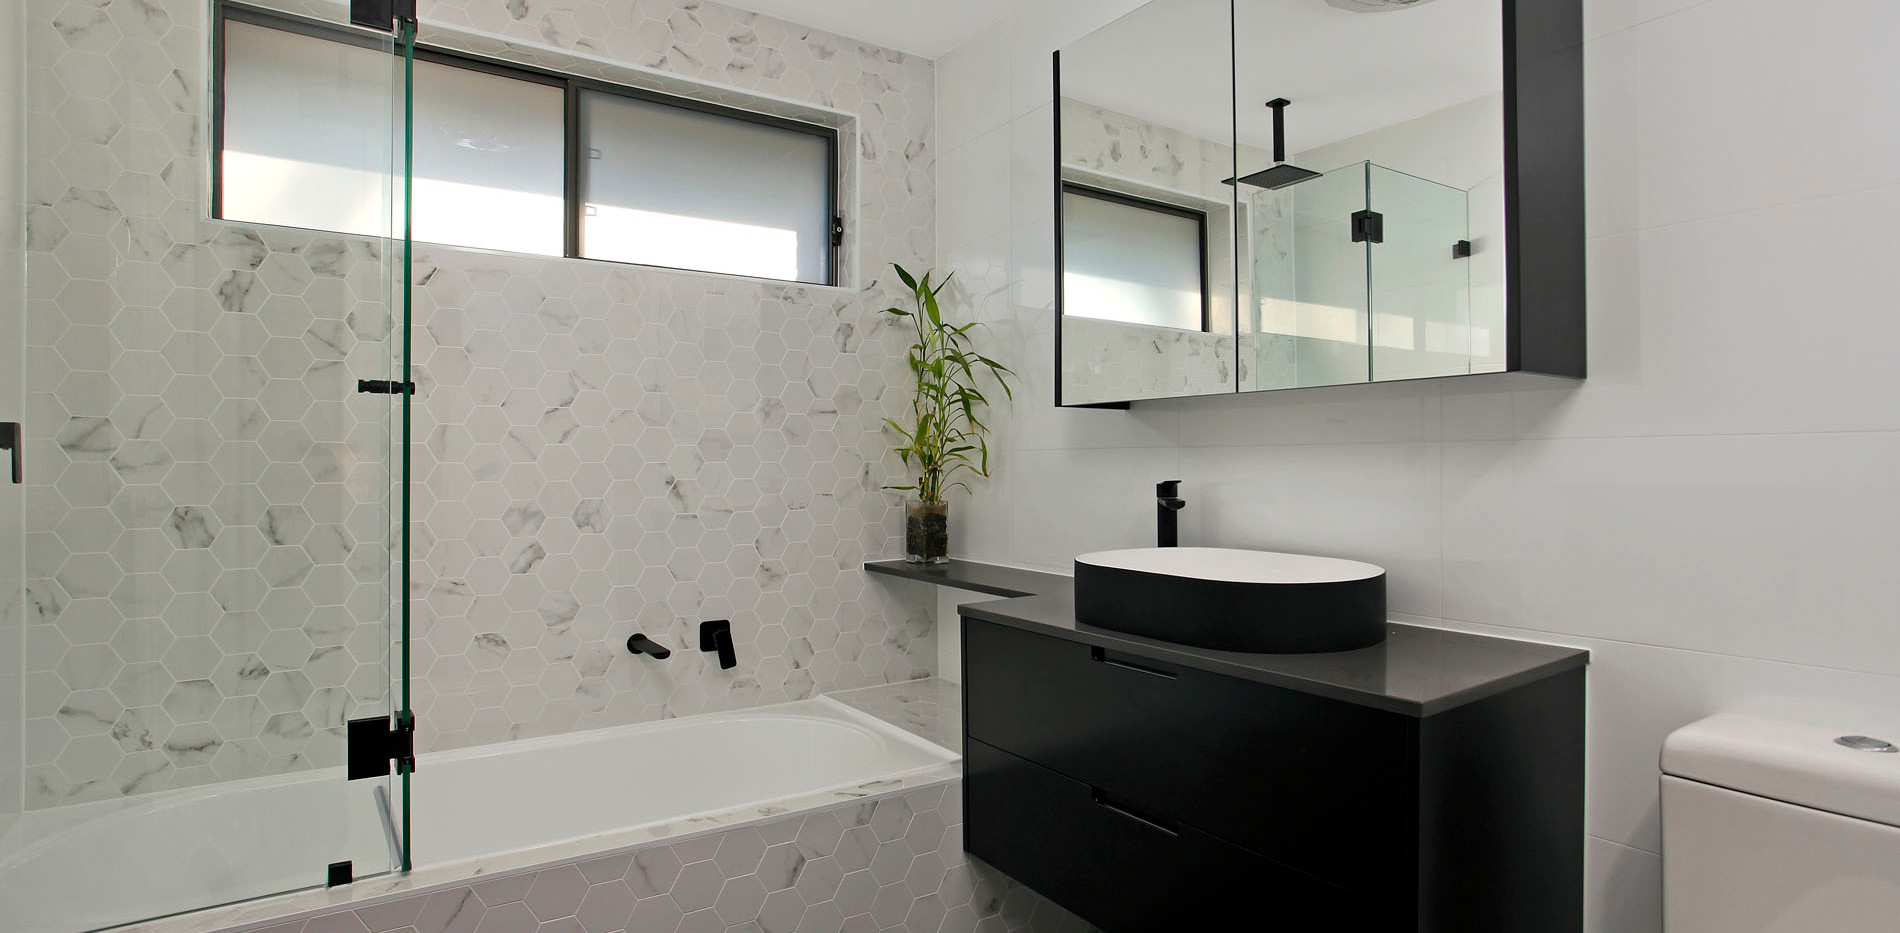 Small Bathrooms-Powder Rooms (26)